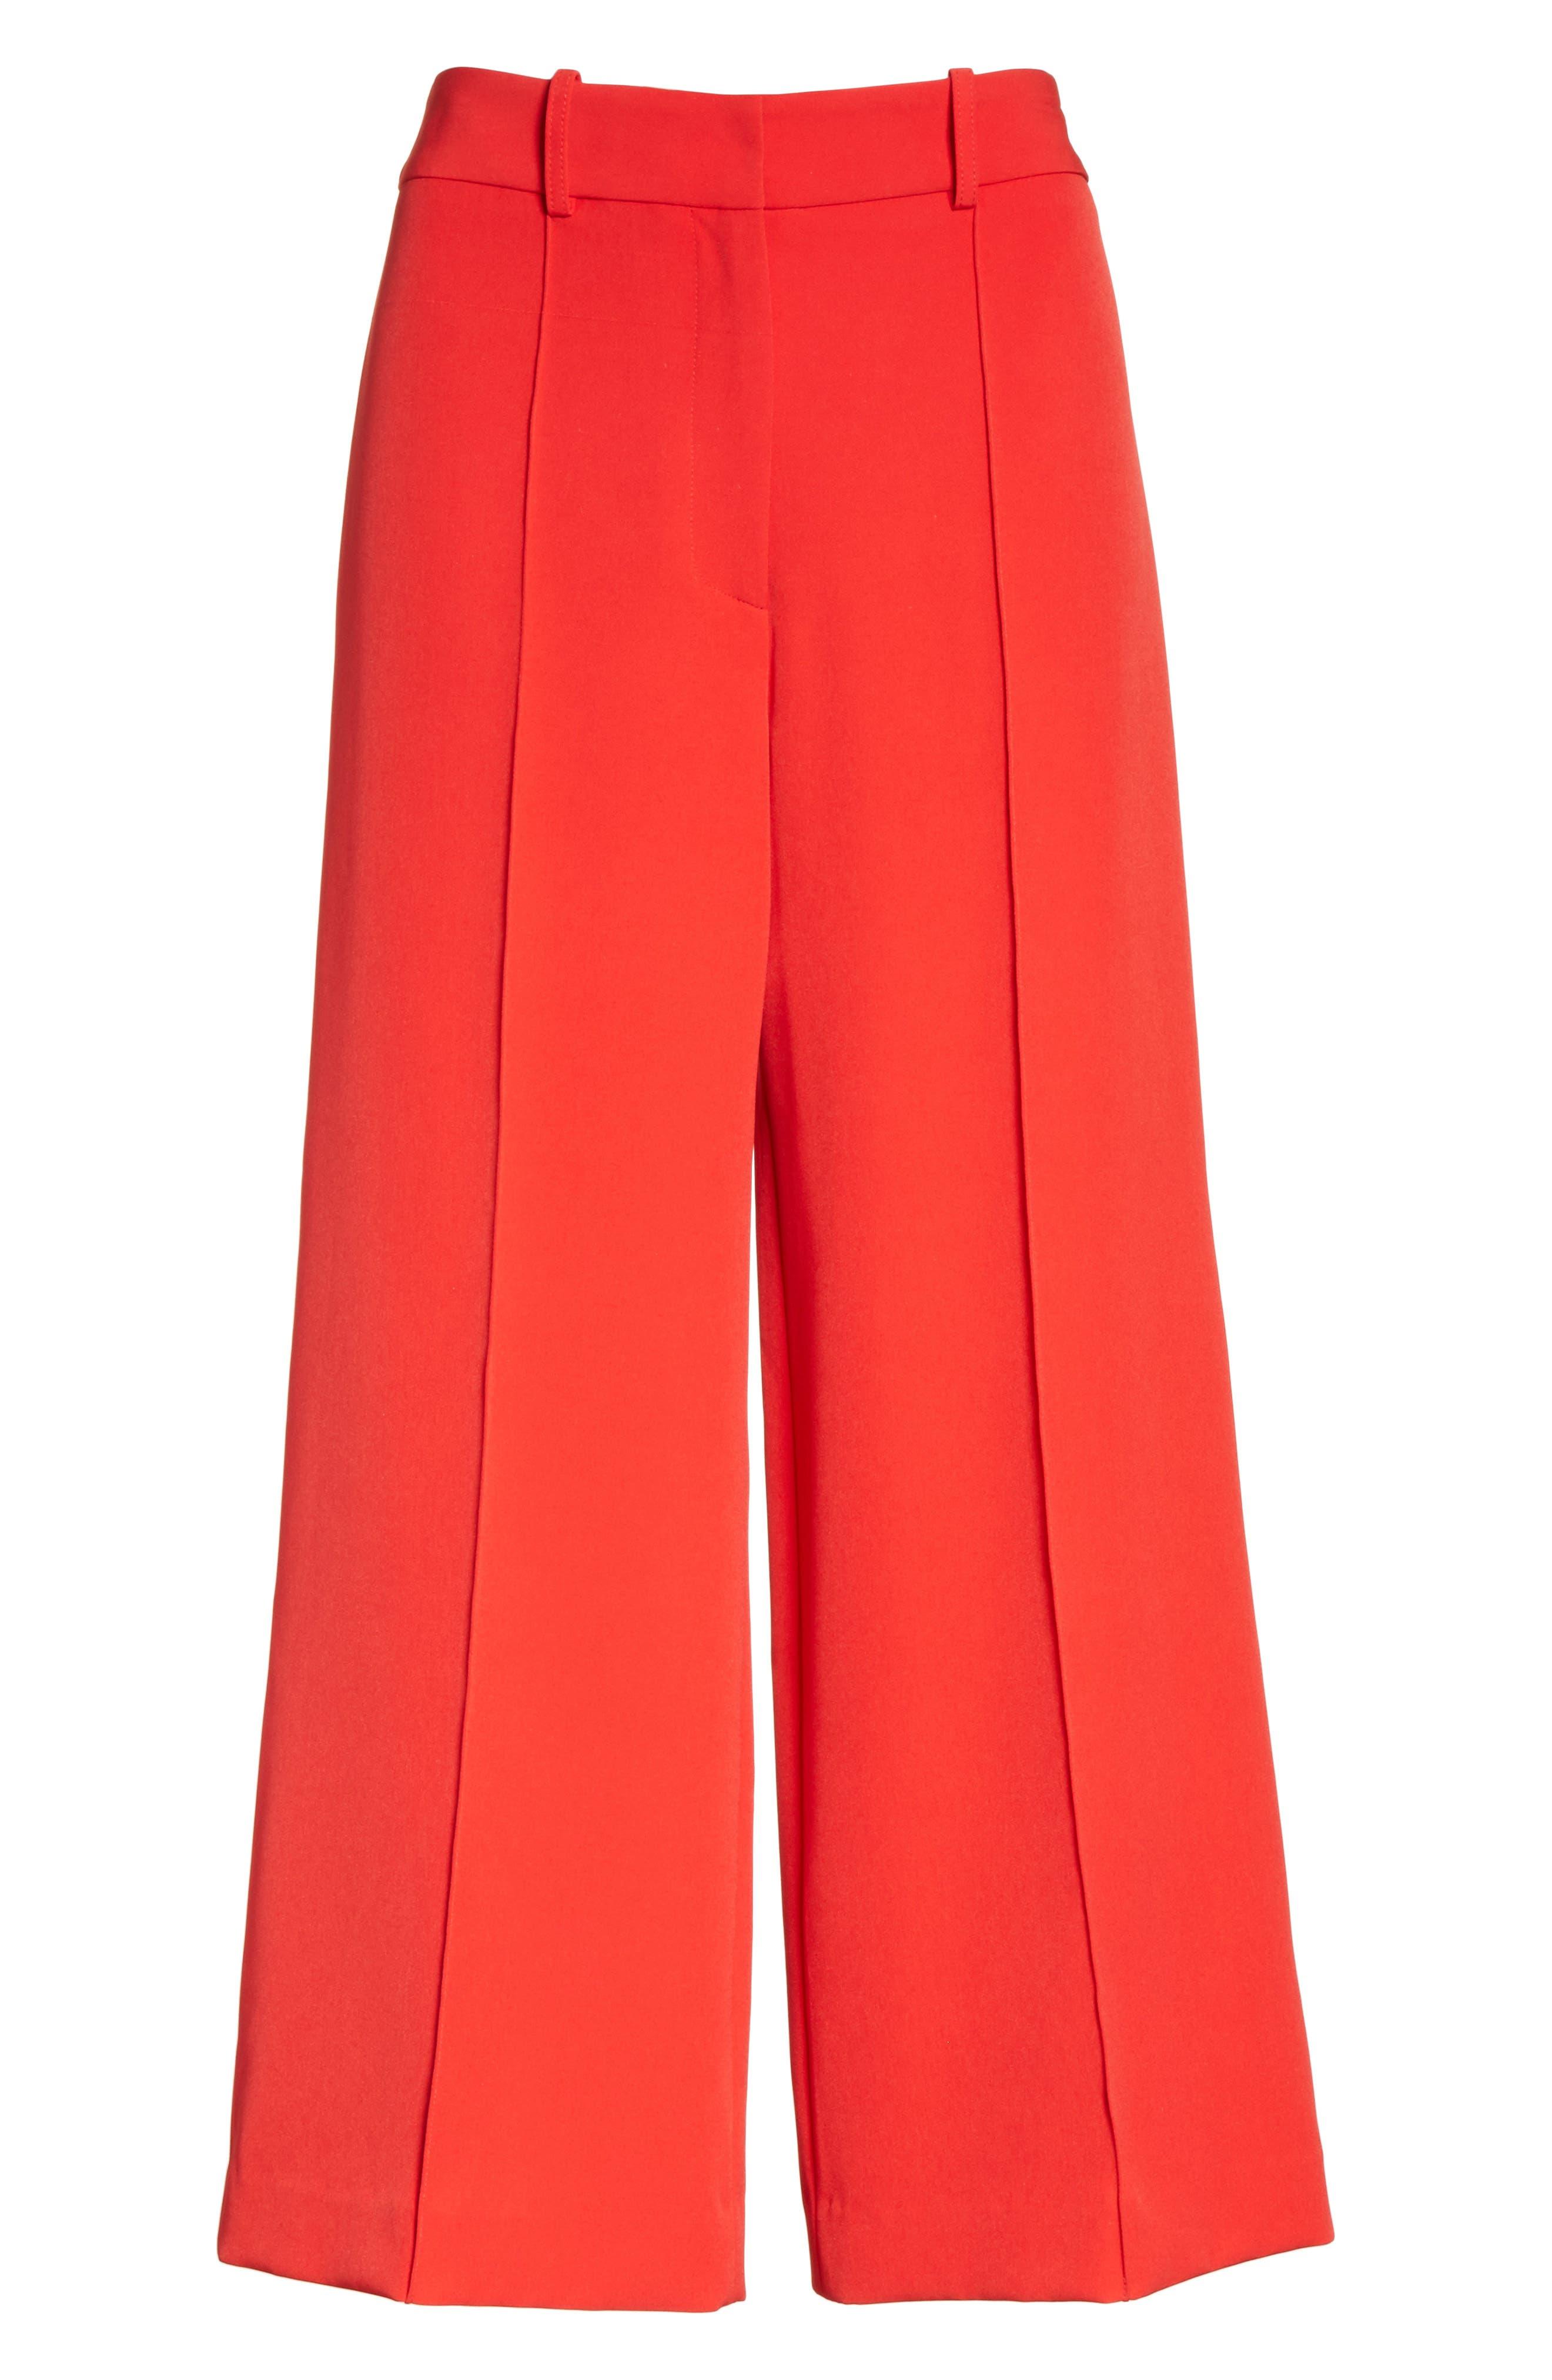 Hayden Italian Cady Crop Pants,                             Alternate thumbnail 6, color,                             649